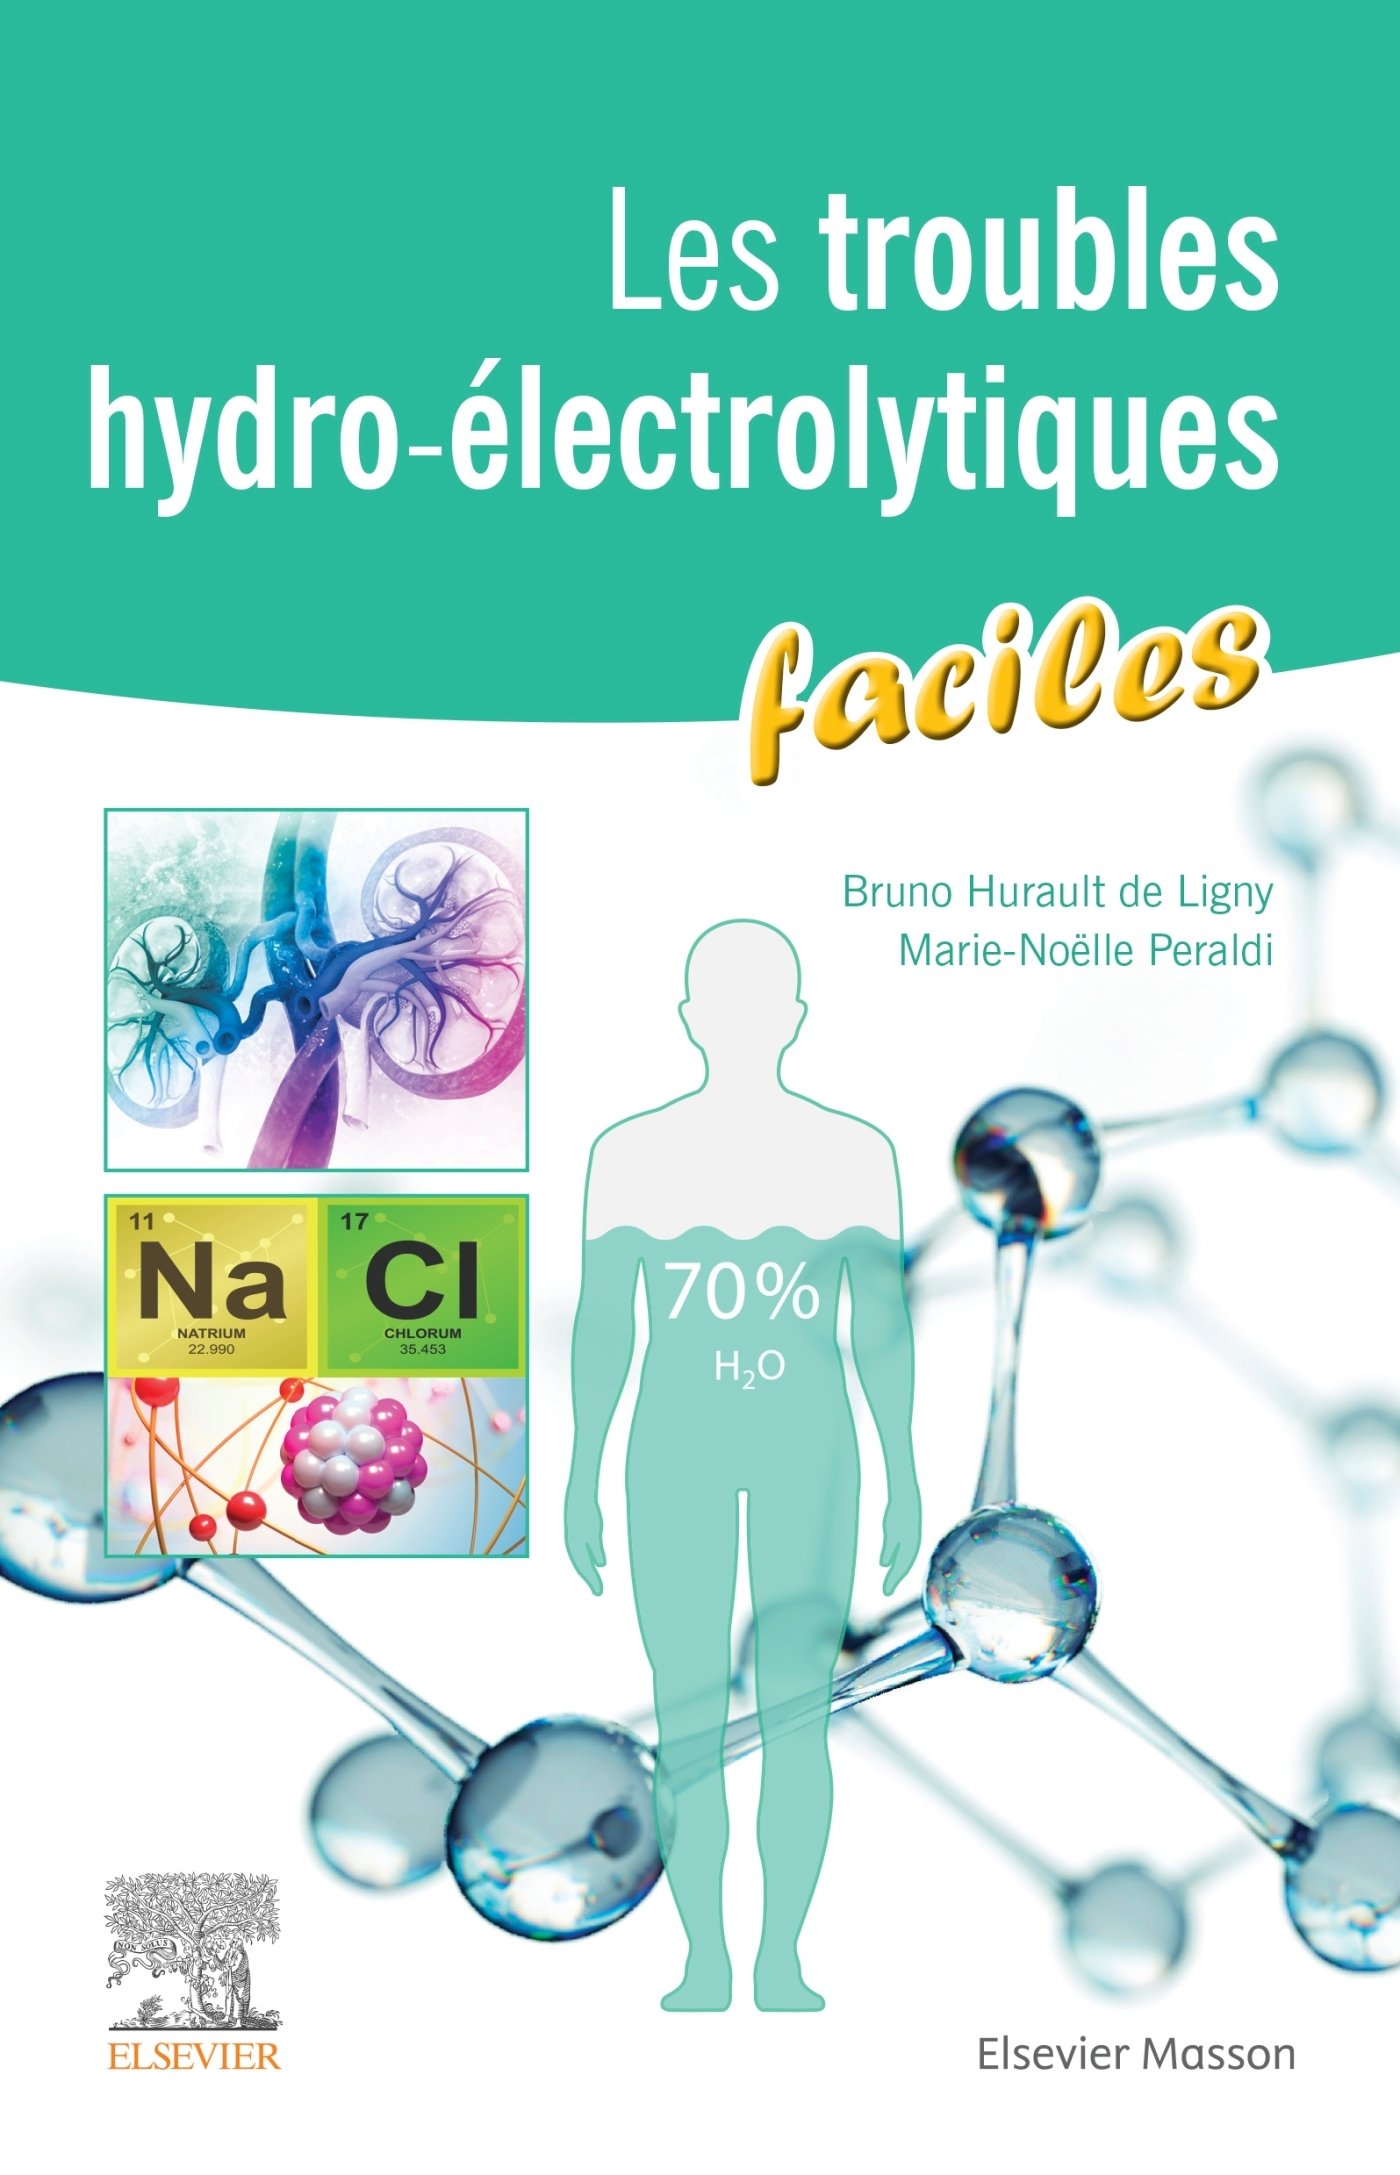 LES TROUBLES HYDRO-ELECTROLYTIQUES FACILES